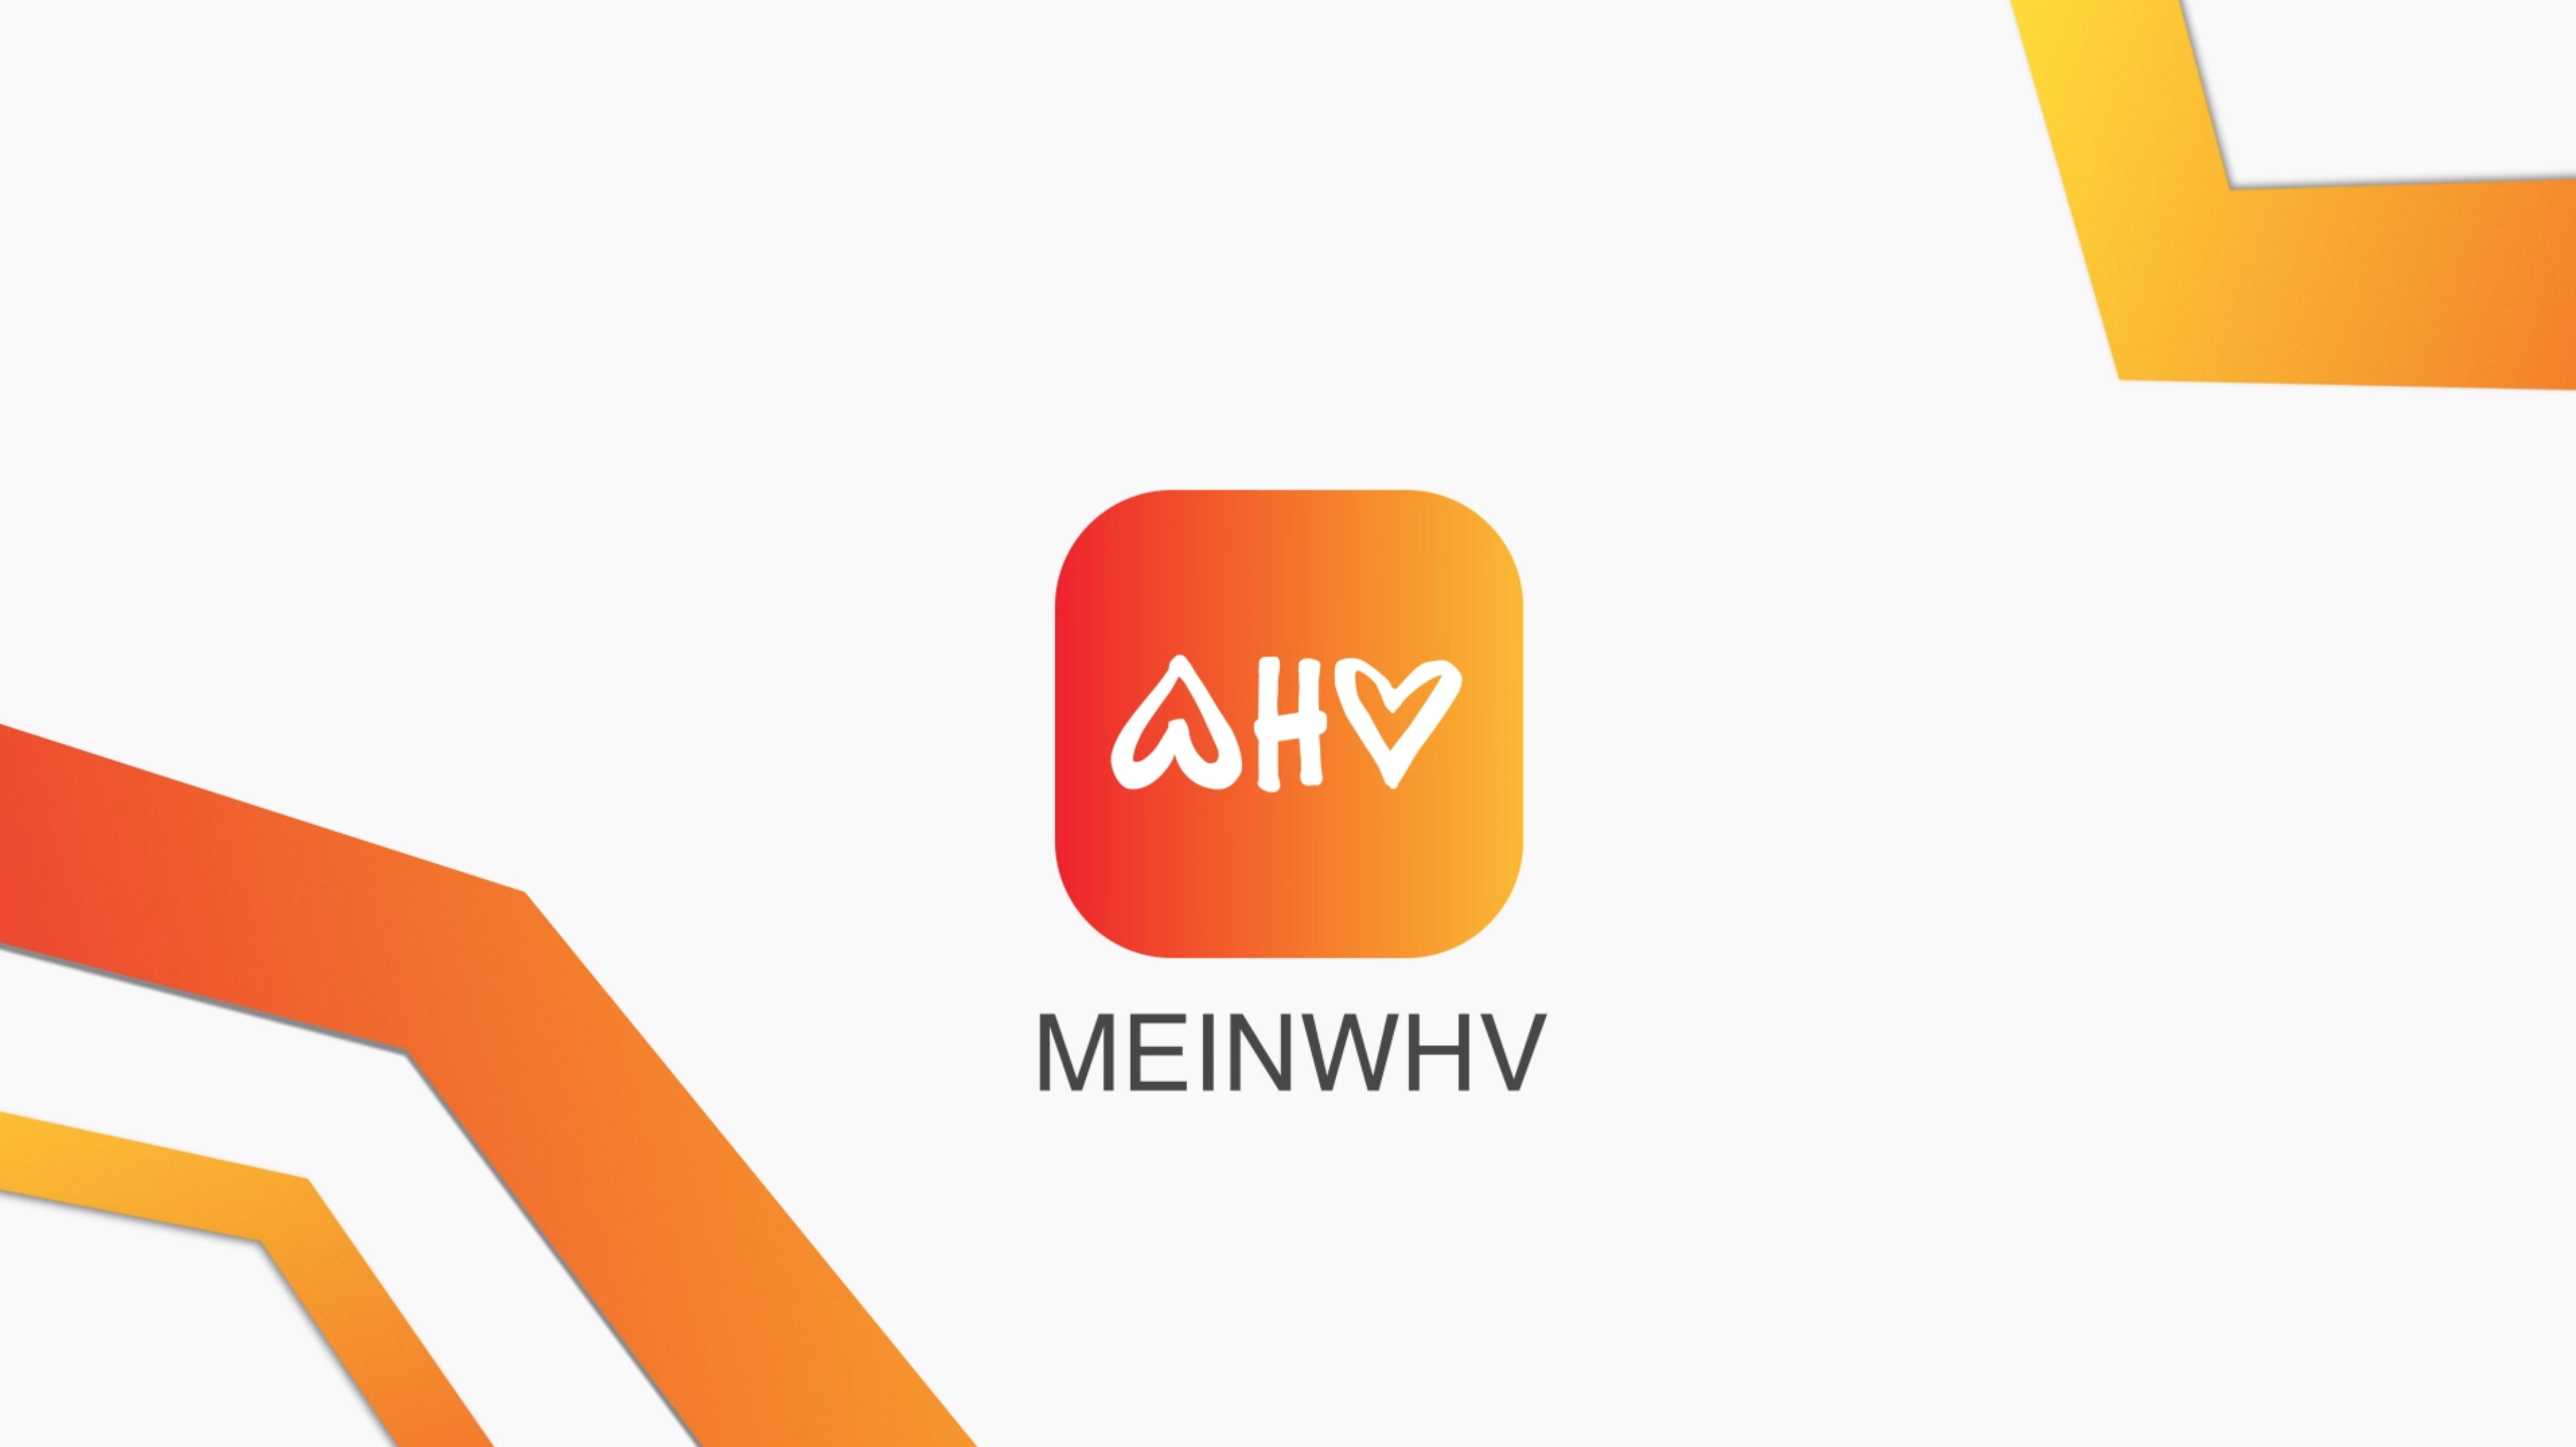 AgendaWHV - meinWHV - APP für den Bürger - jetzt verfügbar - Agenda WHV